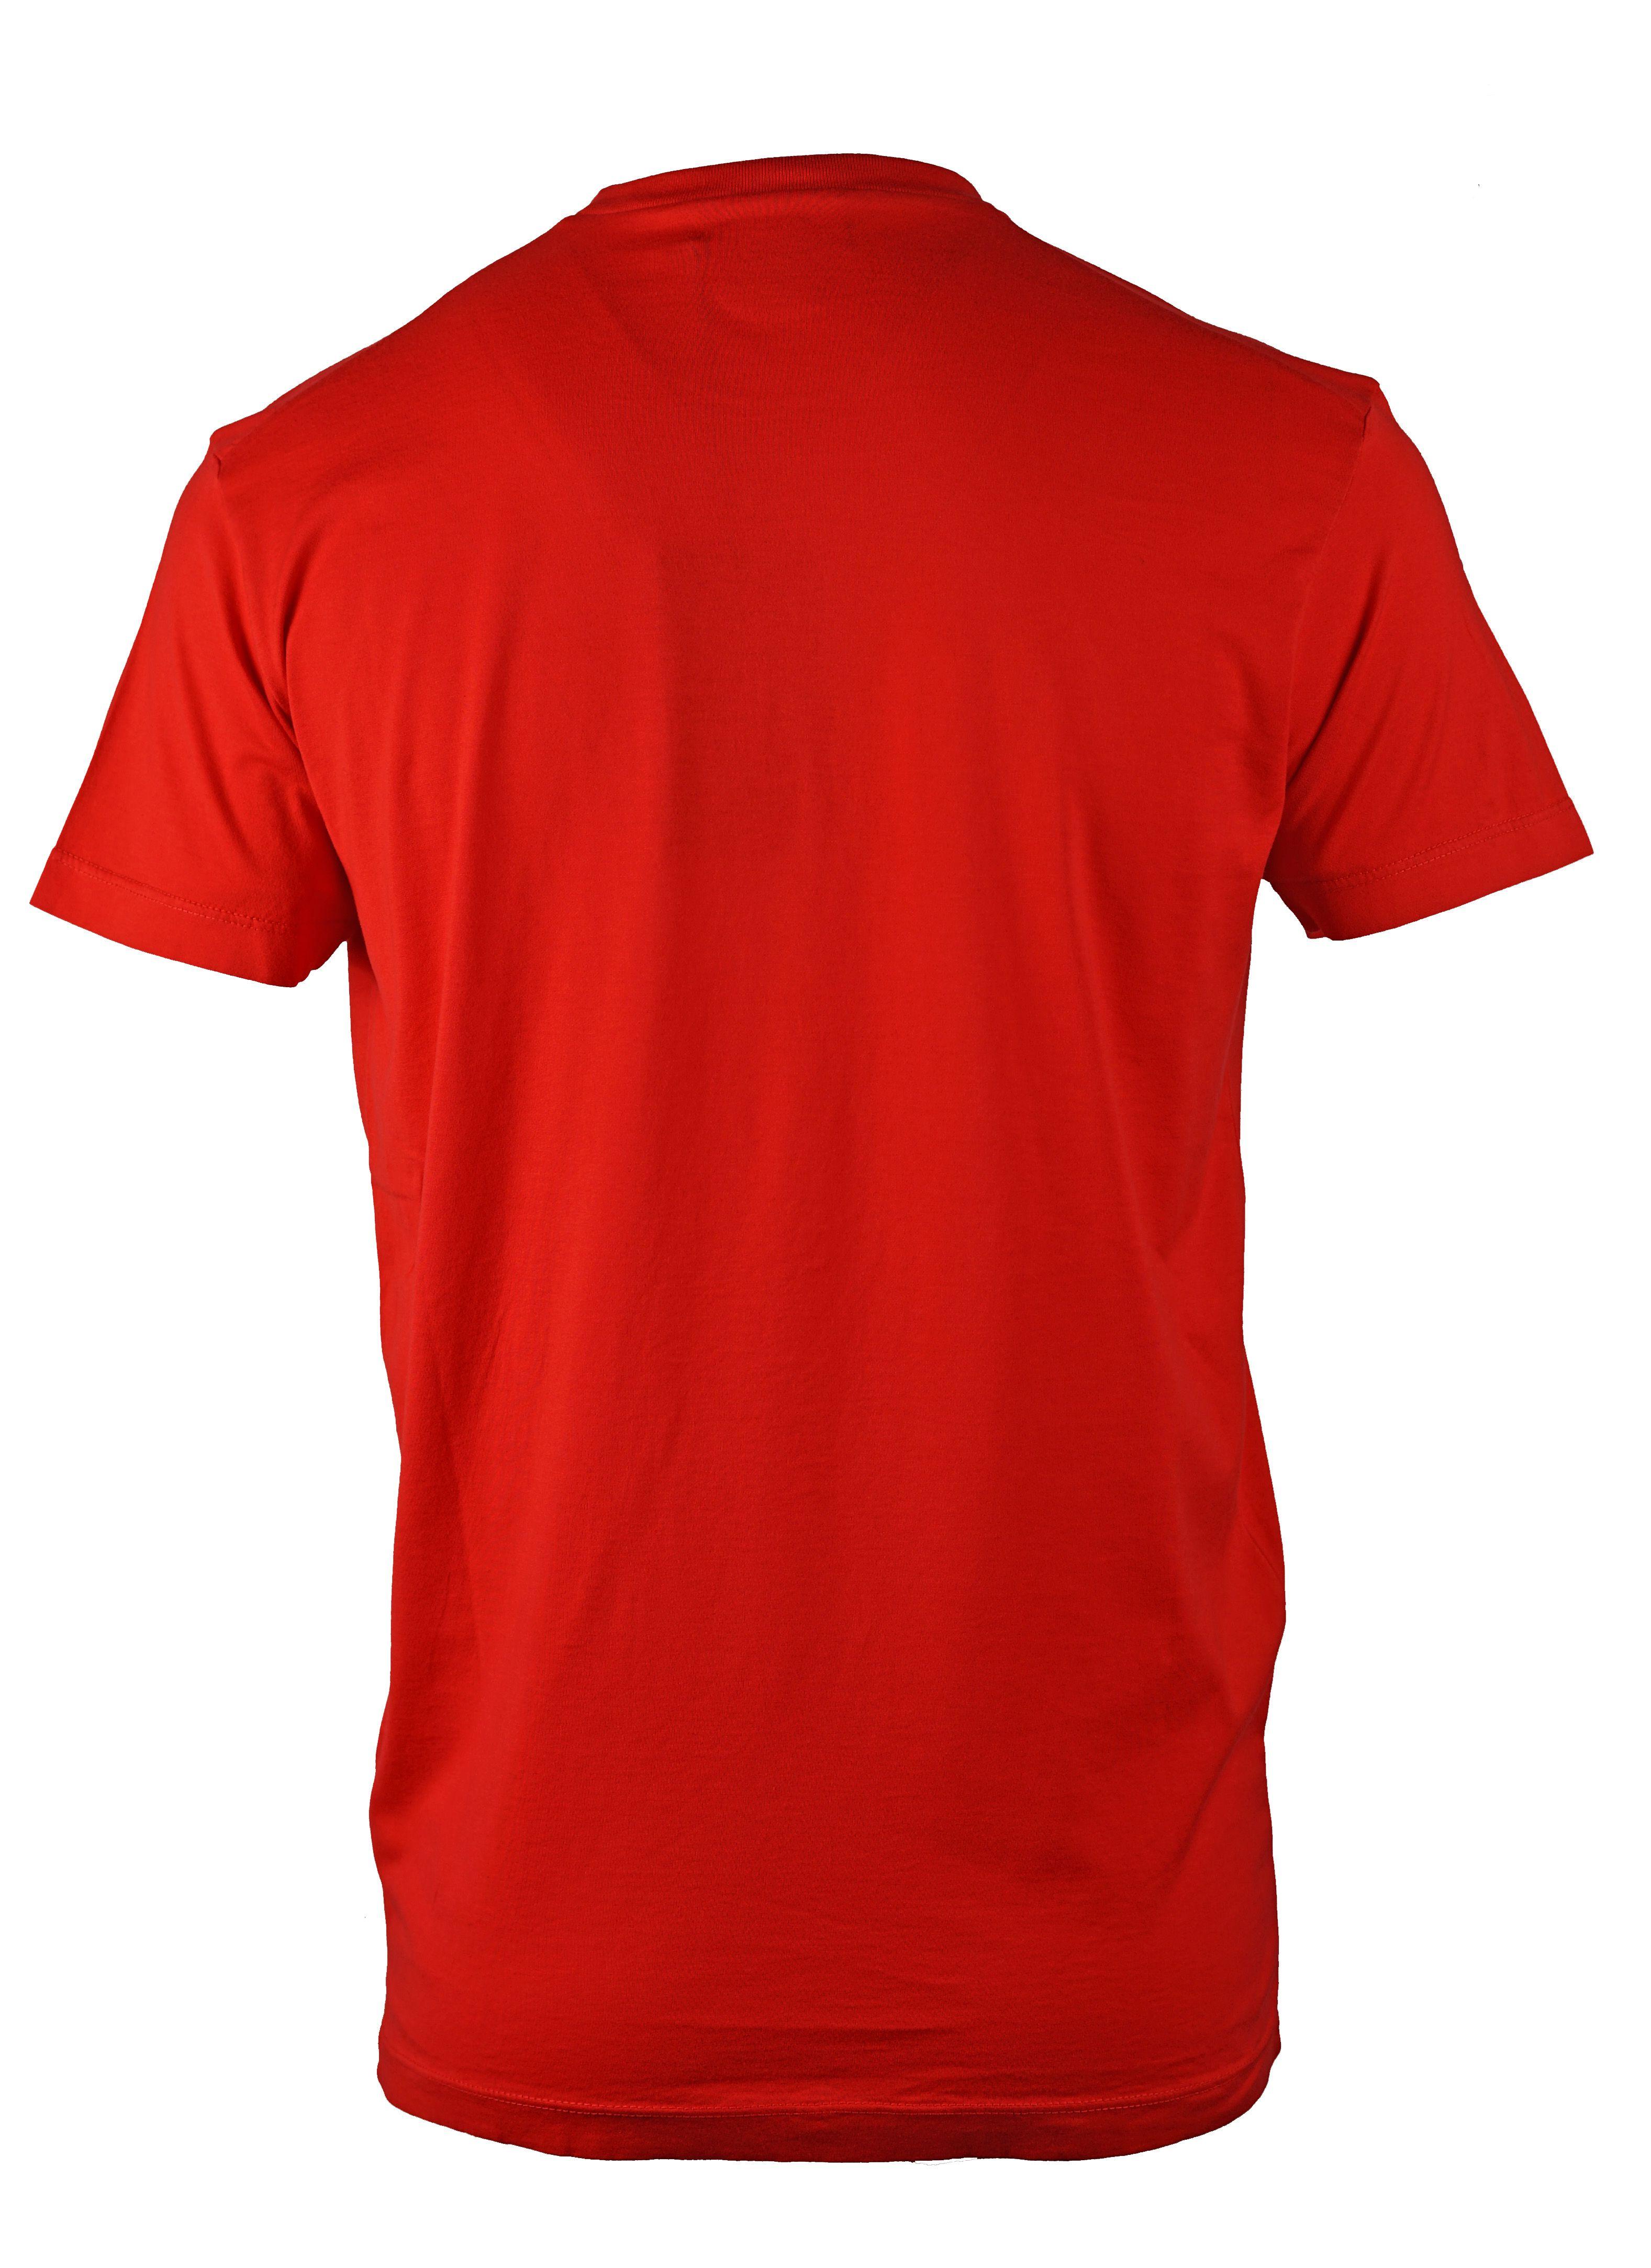 DSquared2 S74GD0494 S22427 304 T-Shirt